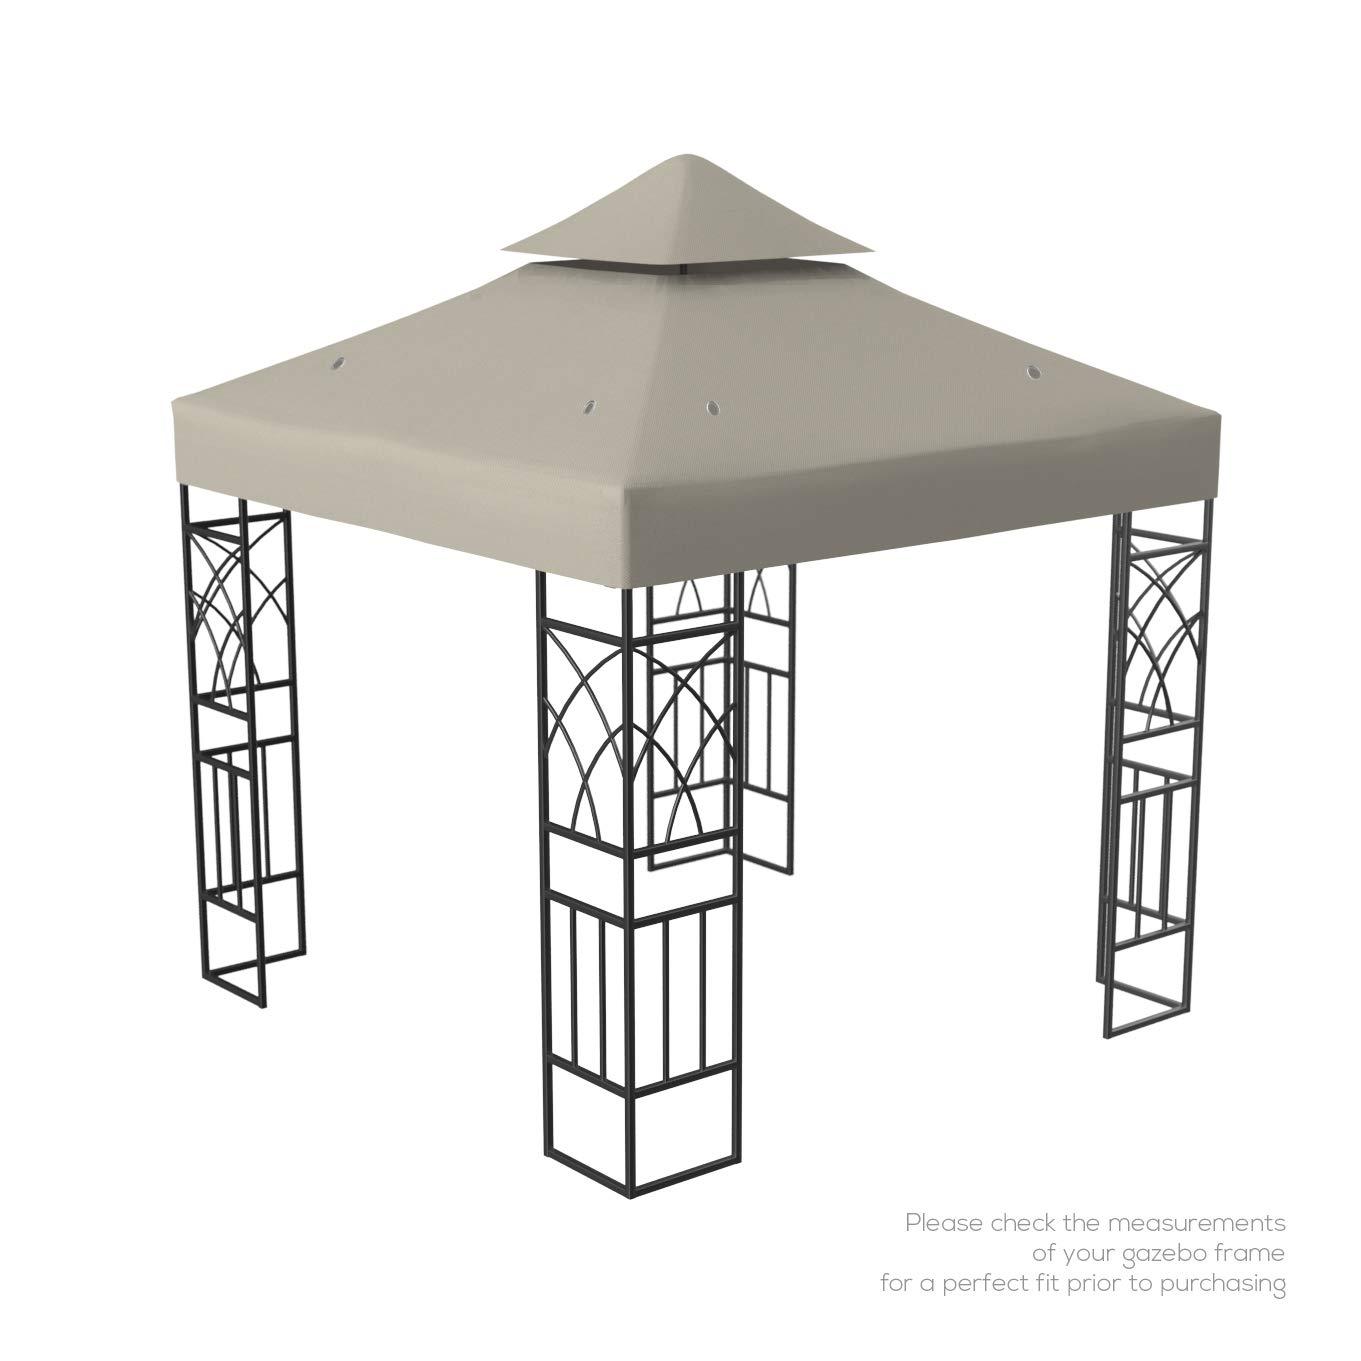 Kenley Gazebo Canopy Replacement Top 10x10 Double Tier